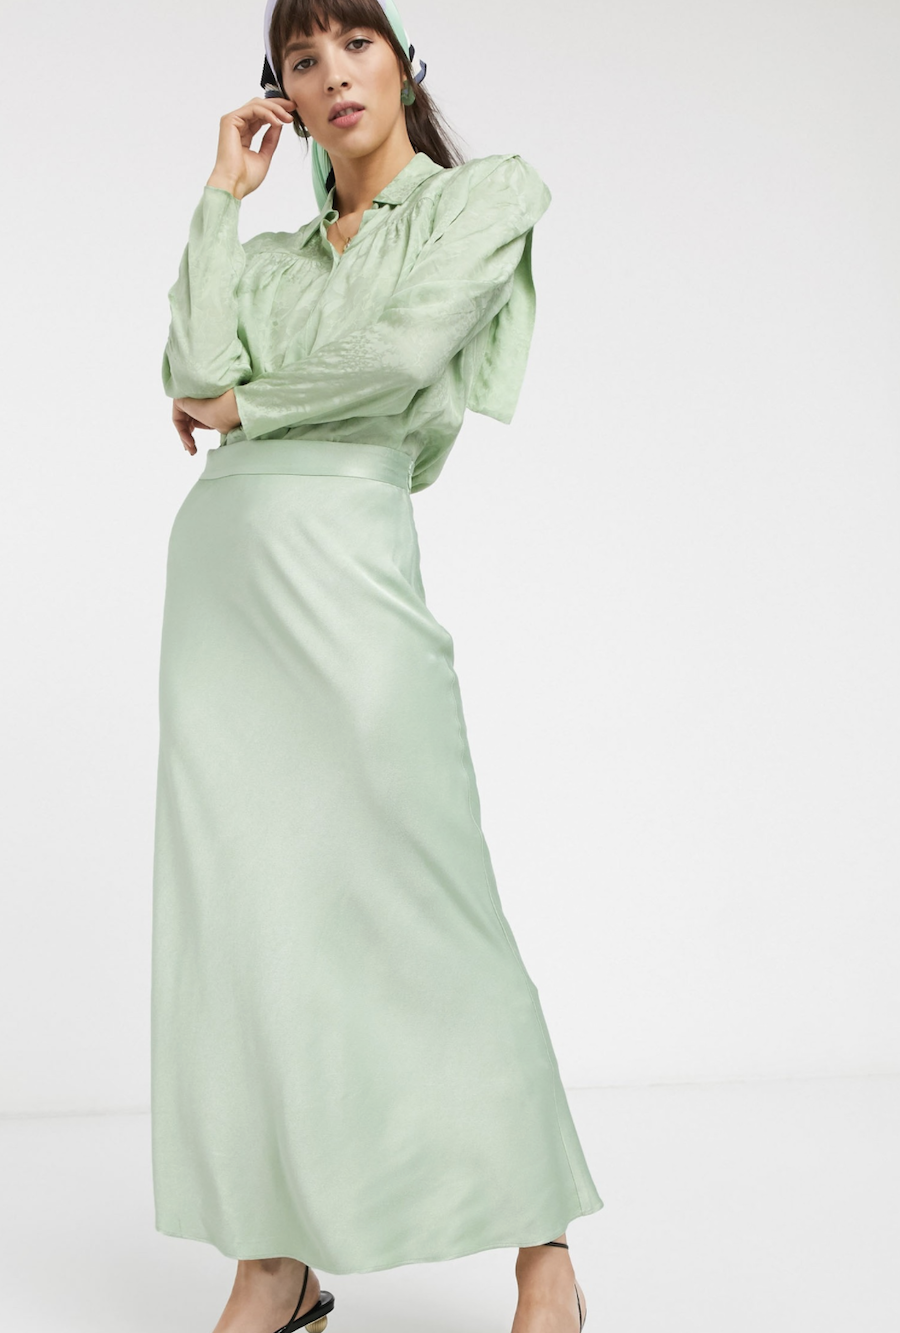 Falda midi de satén en verde menta de & Other Stories